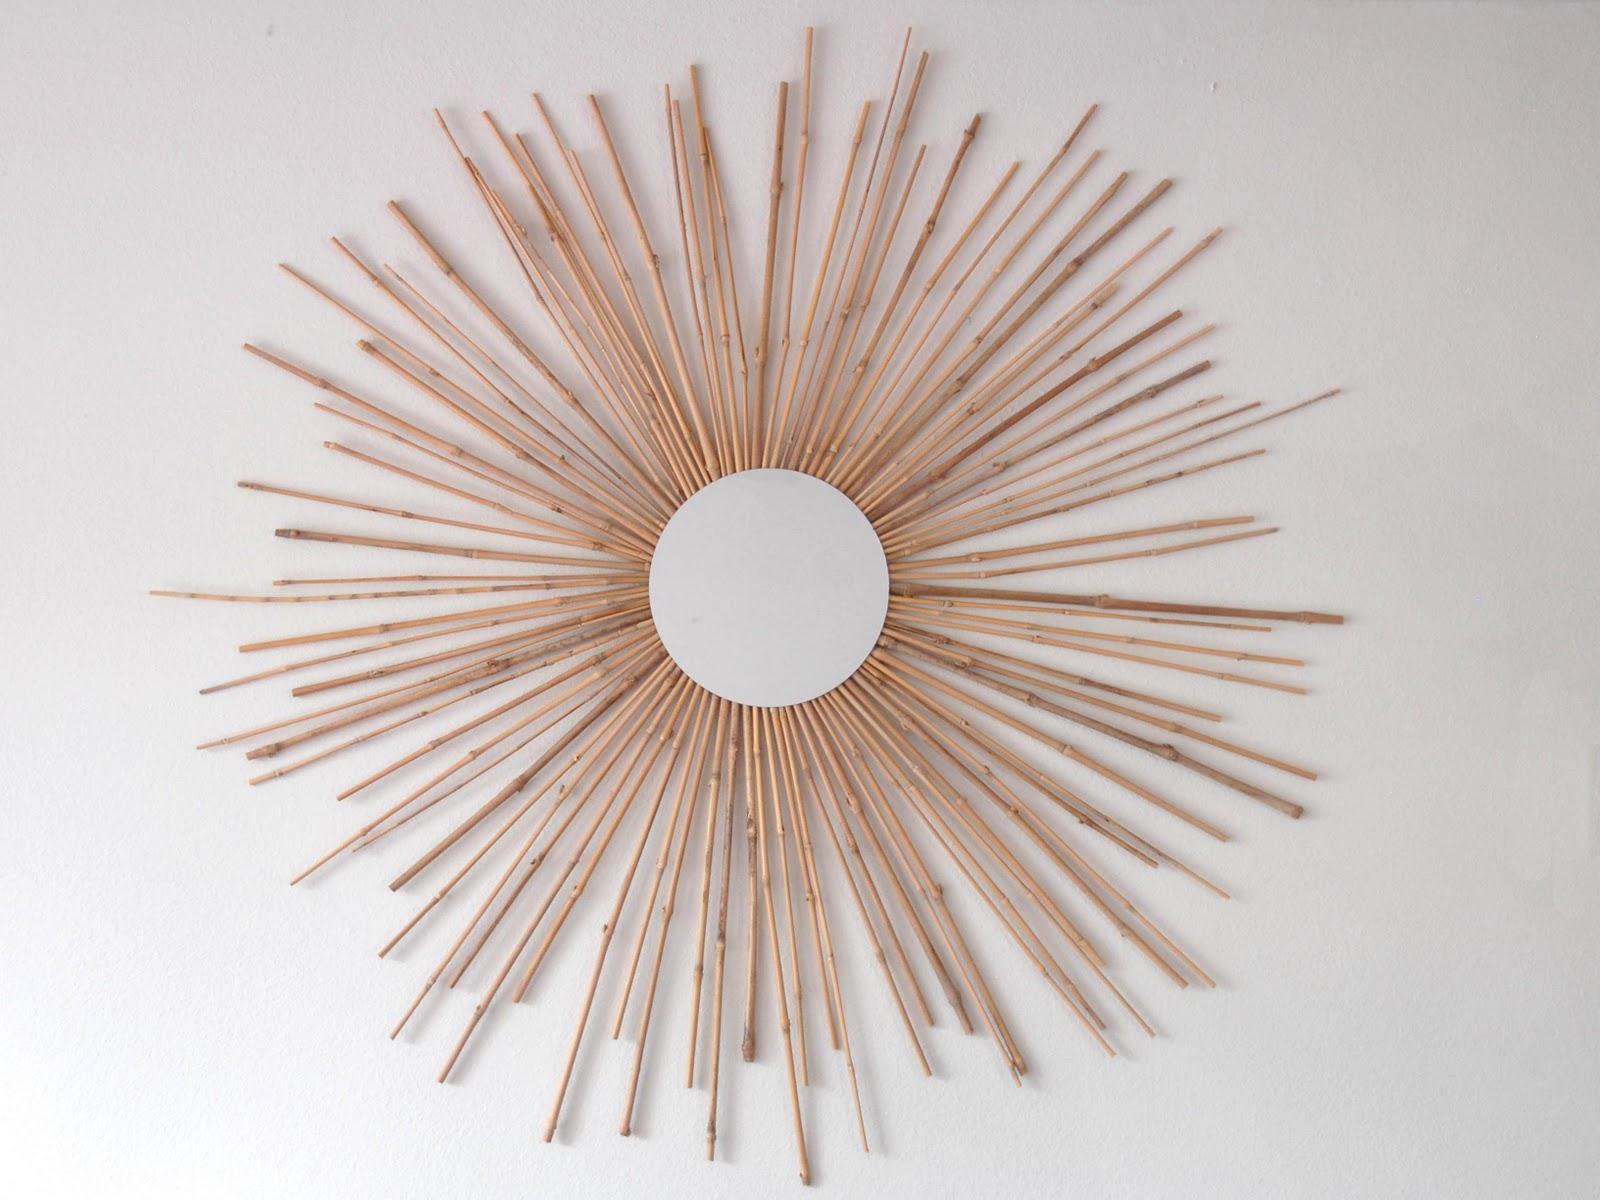 Sewing tutorials crafts diy handmade shannon sews for Sunburst mirror